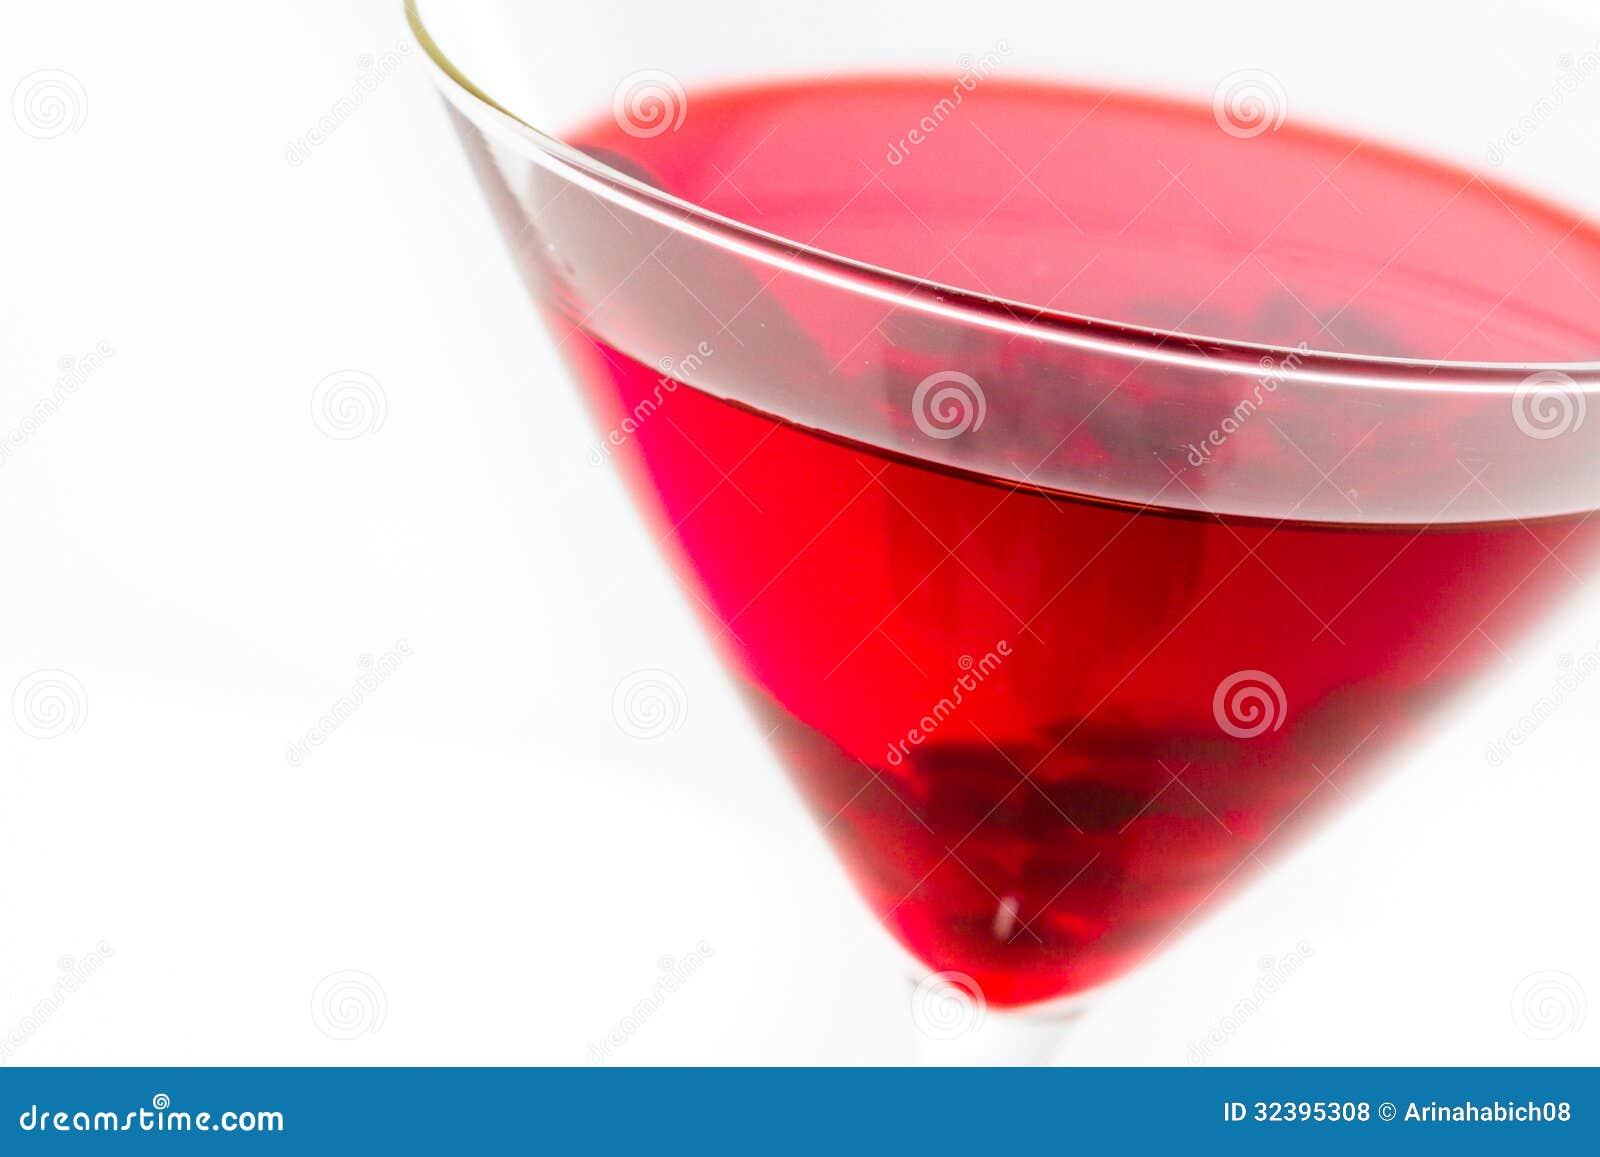 Pomegranate Cosmo Royalty Free Stock Photos - Image: 32395308